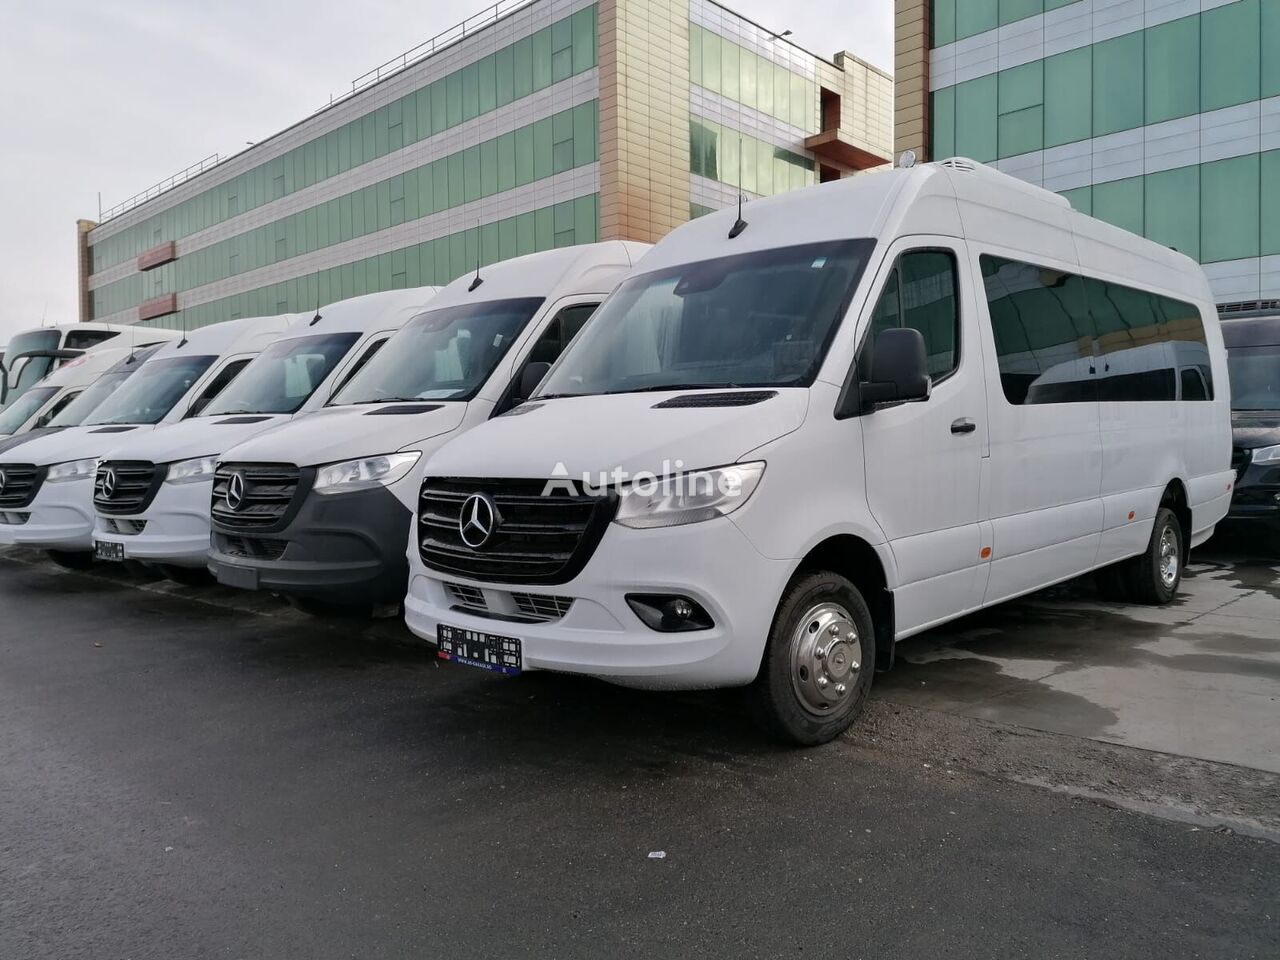 new MERCEDES-BENZ Sprinter 519 BAVARIA JERUSALIM TRANSFER COC New Vehicle passenger van